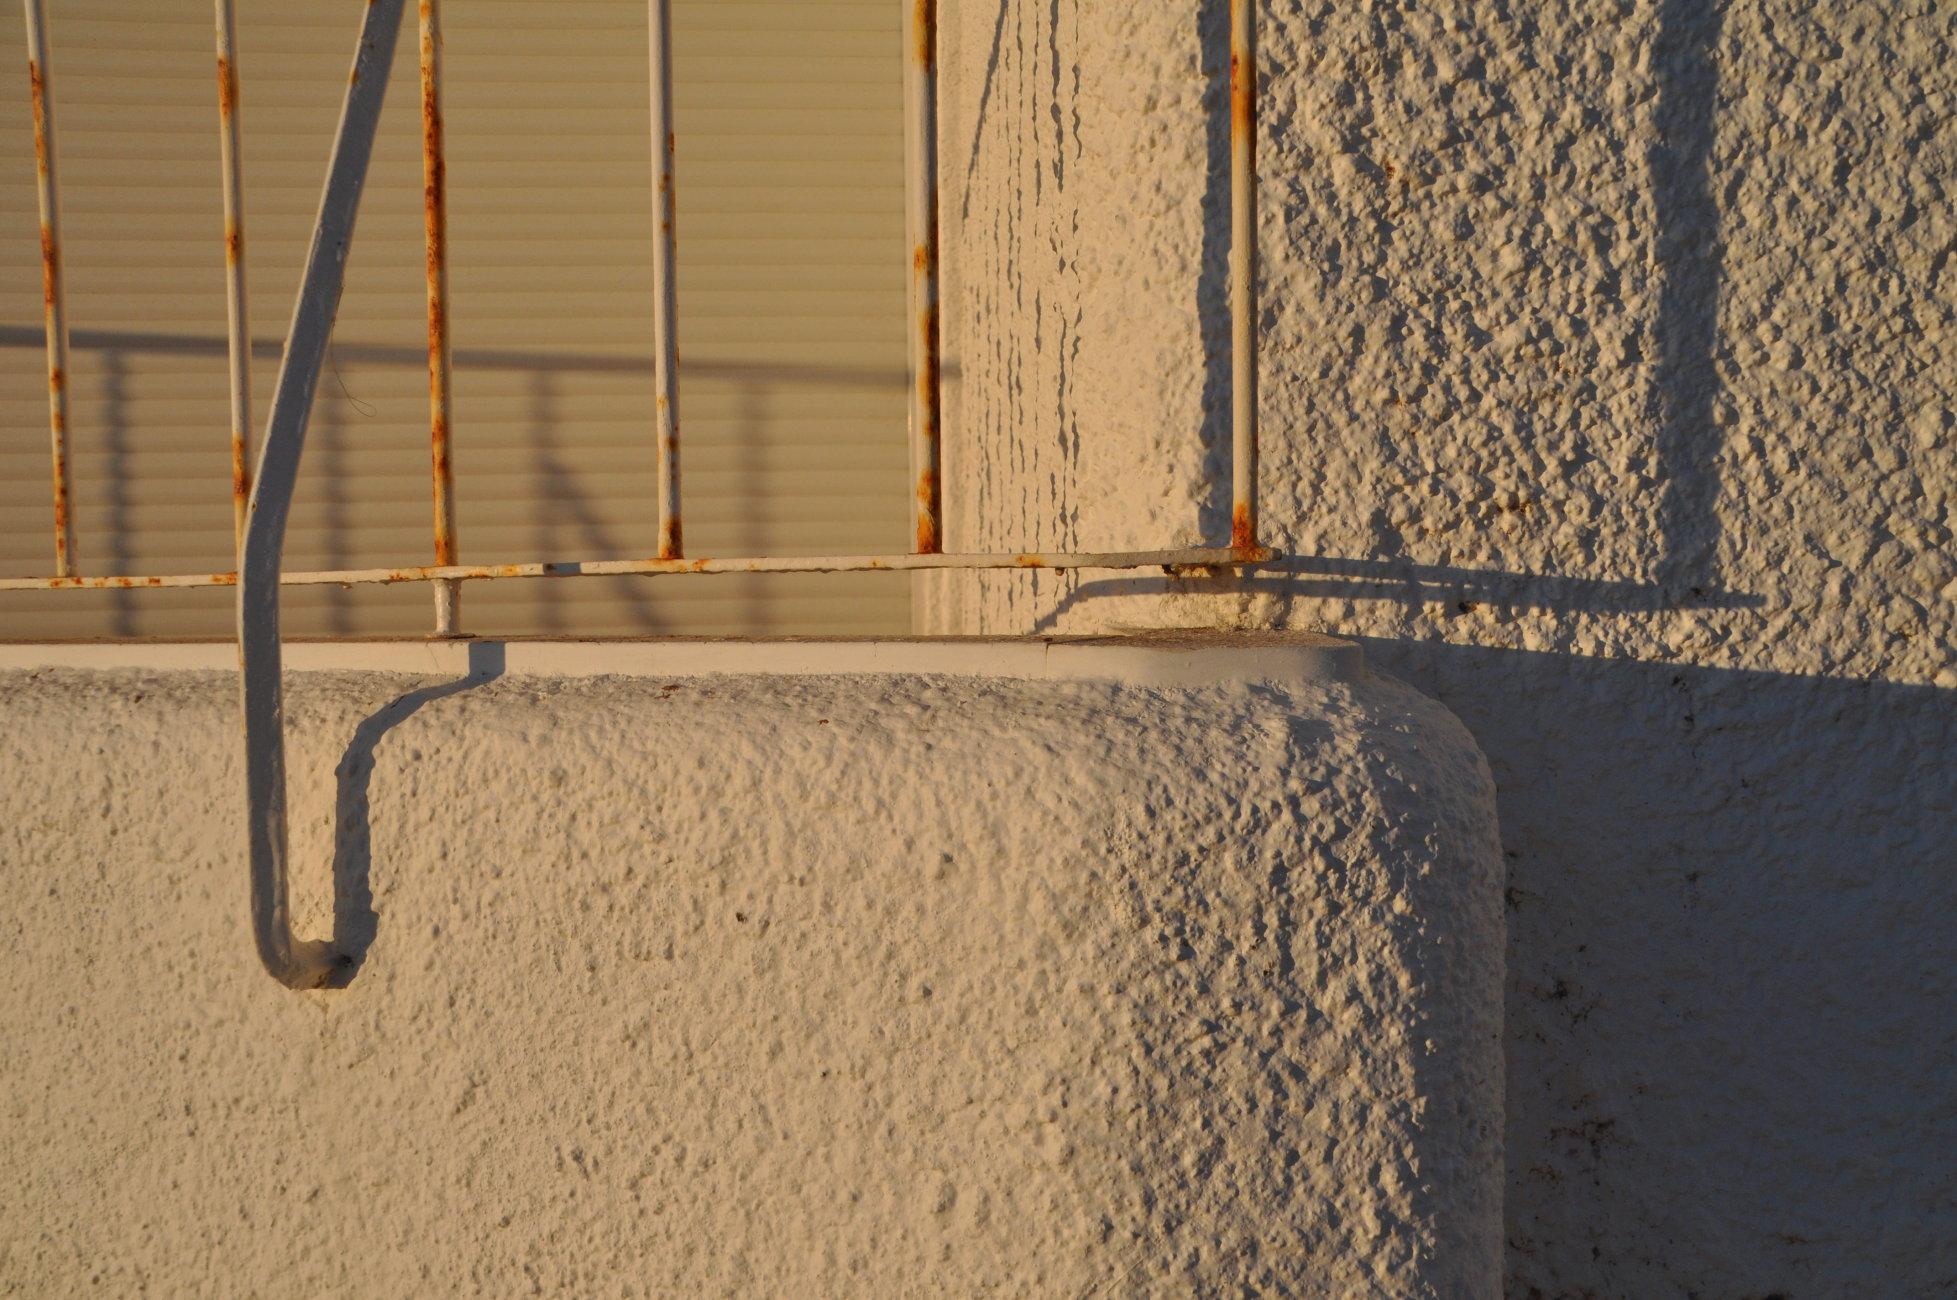 Wall & shadows...